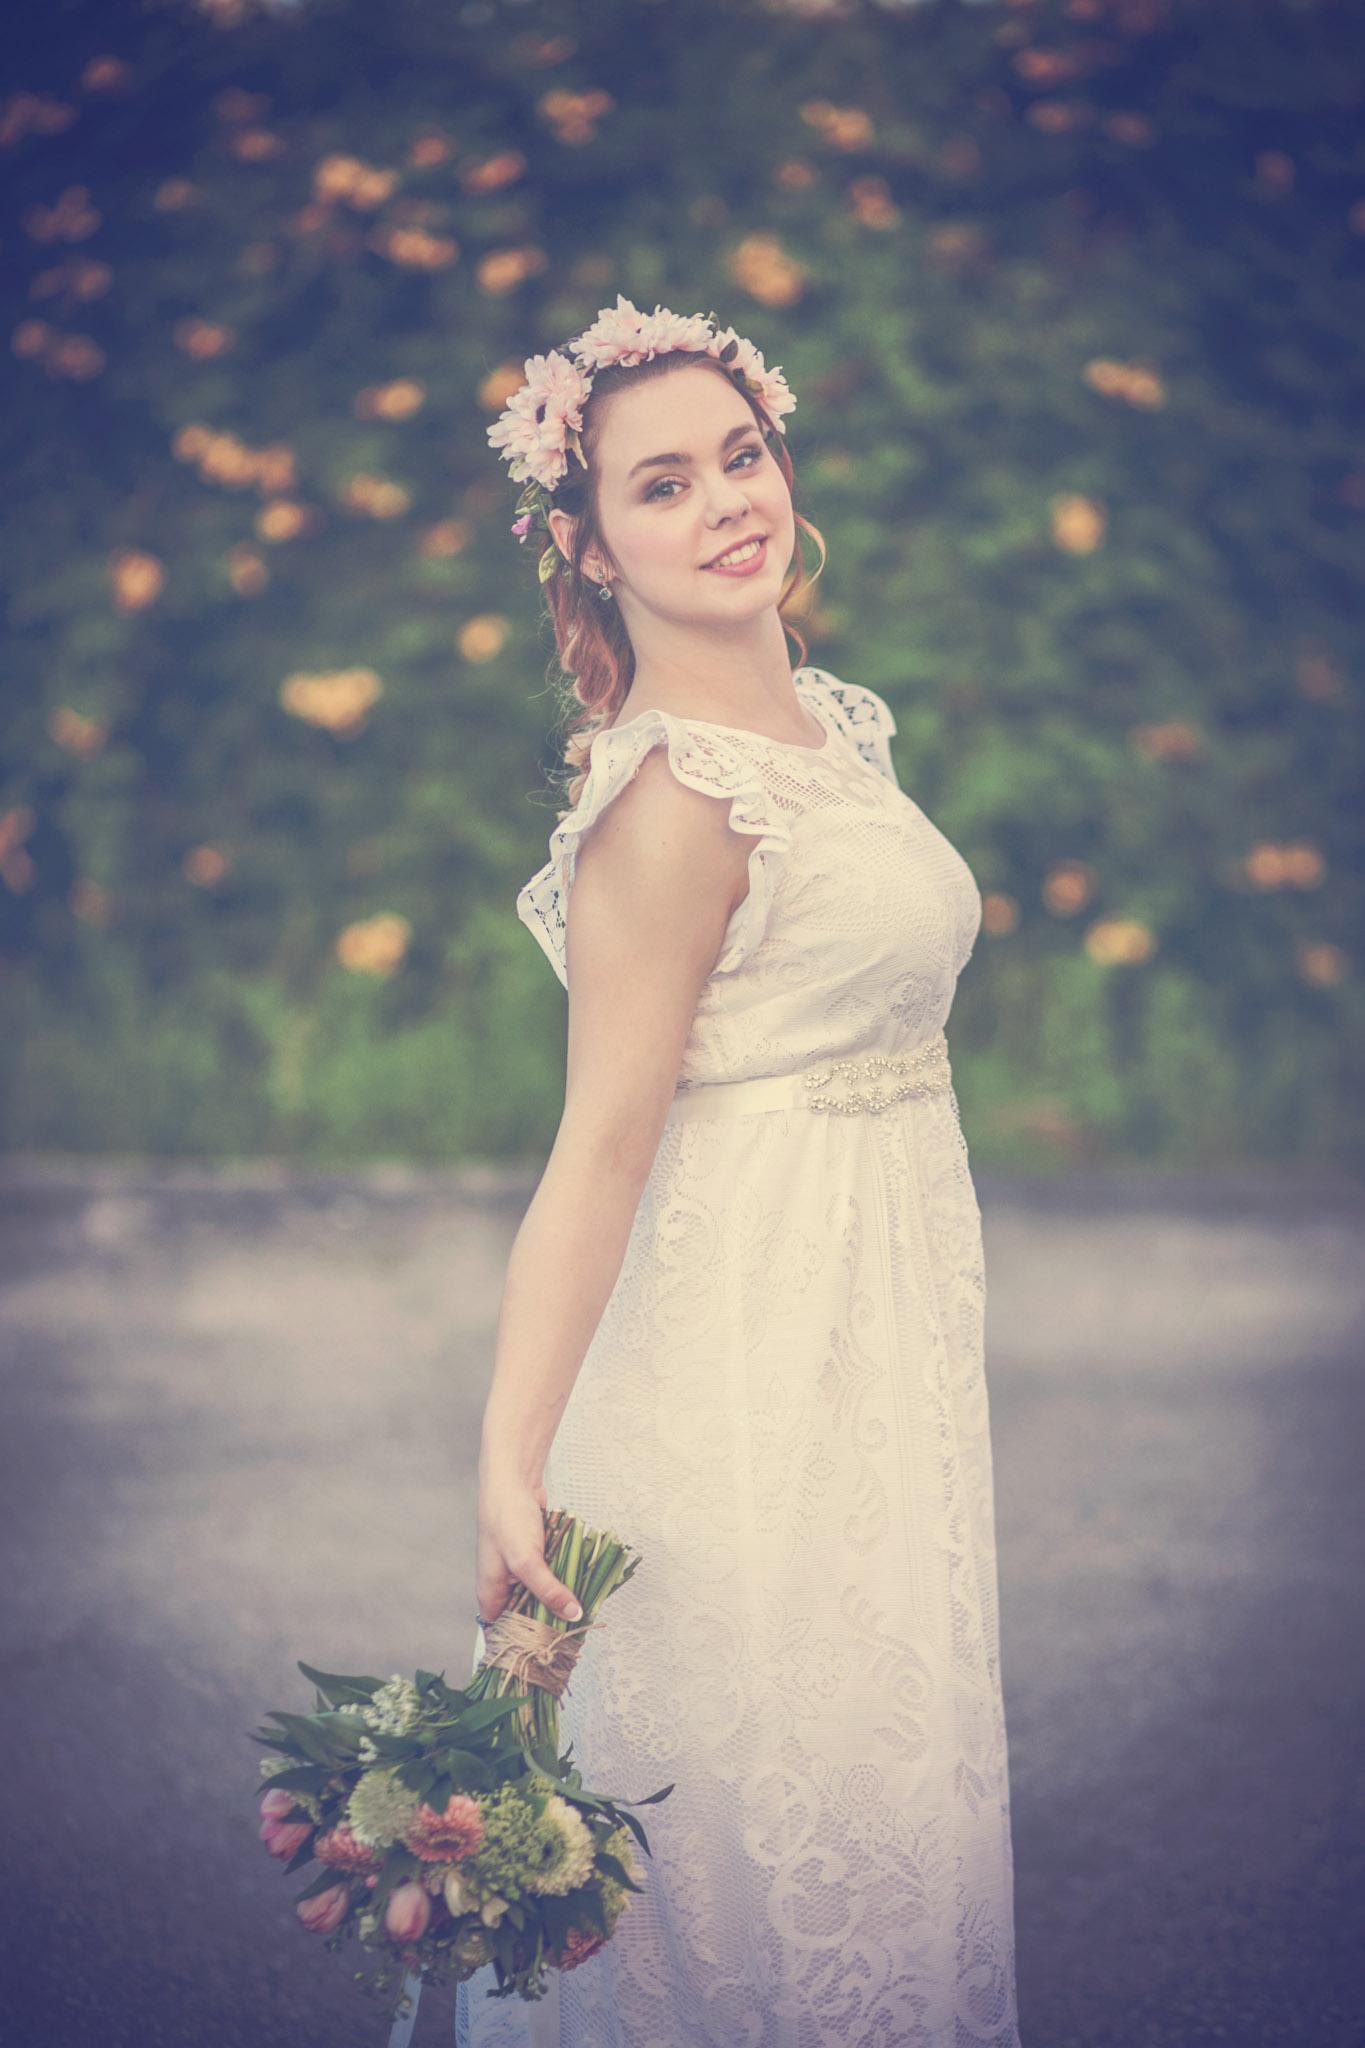 Kansas_City_Small_Wedding_Venue_Elope_Intimate_Ceremony_Budget_Affordable_Sophie&Philip_252b.jpg